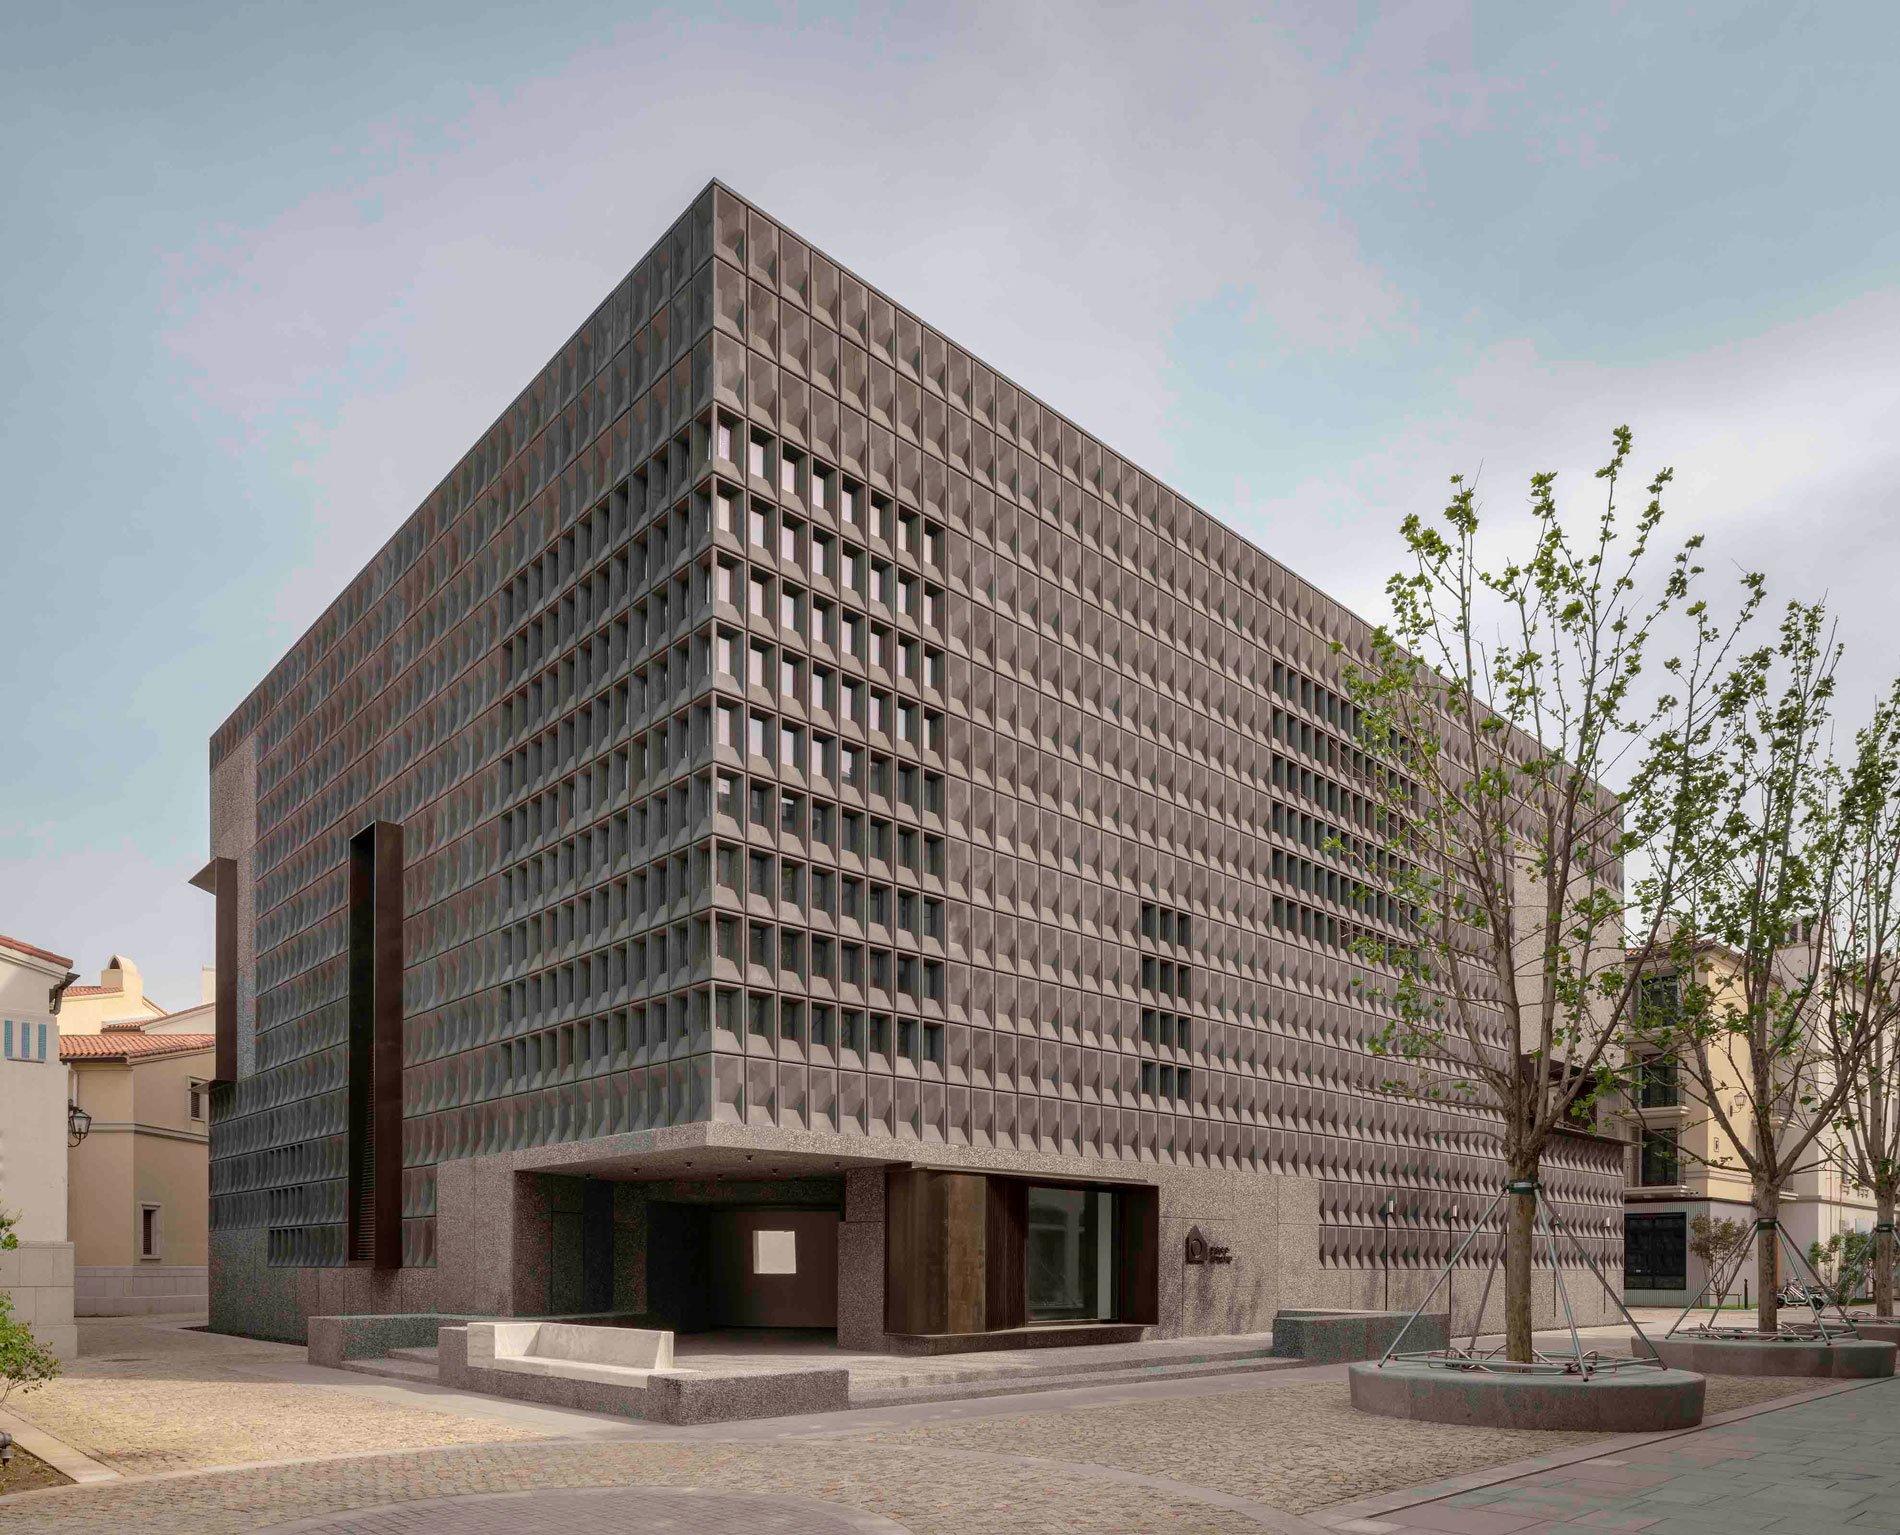 Aranya Art Center Designed by Neri&Hu Pedro Pegenaute